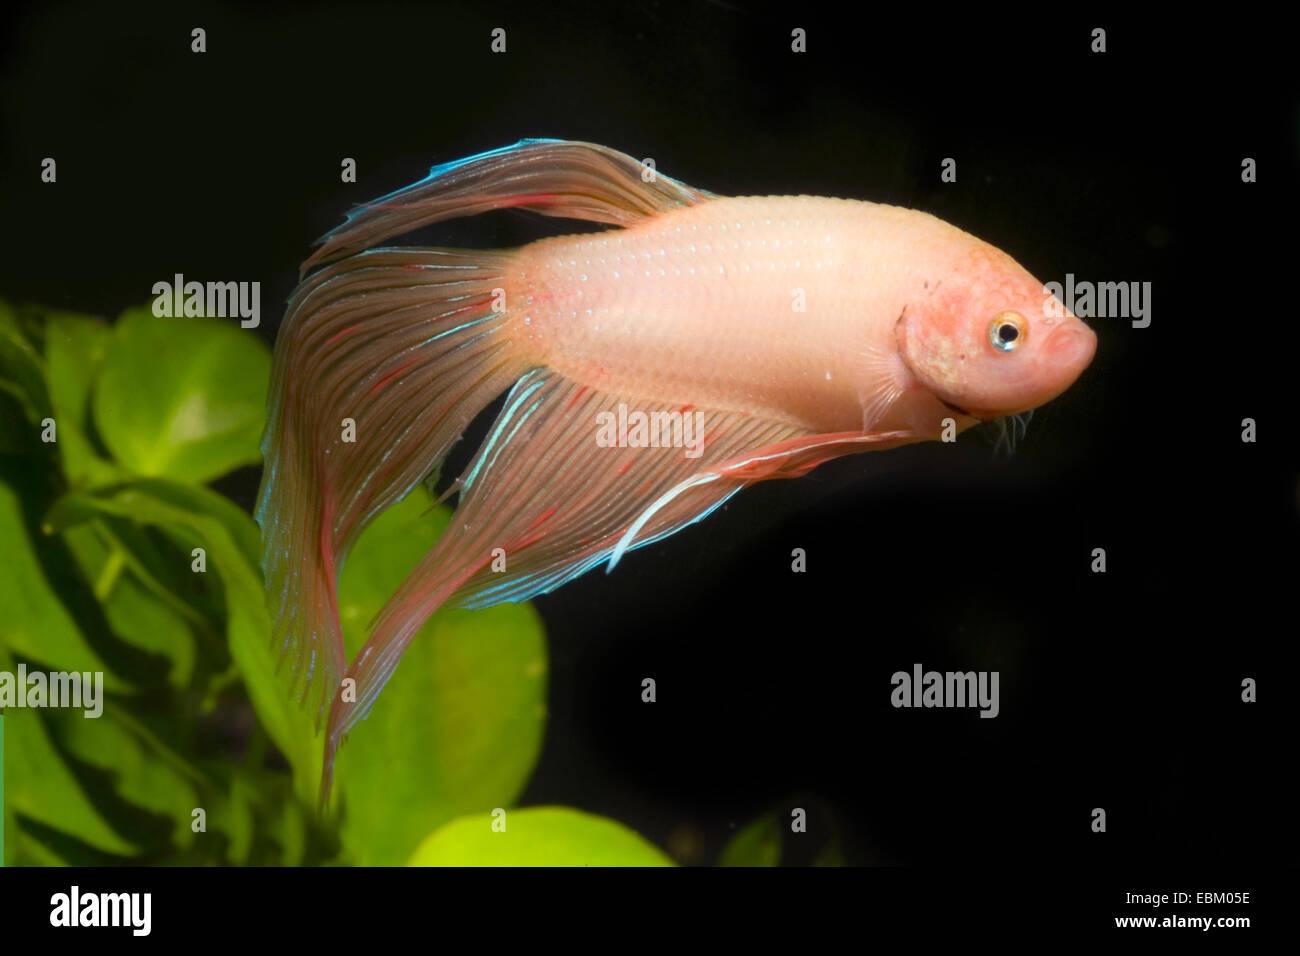 Siamese fighting fish, Siamese fighter (Betta splendens), breed - Stock Image